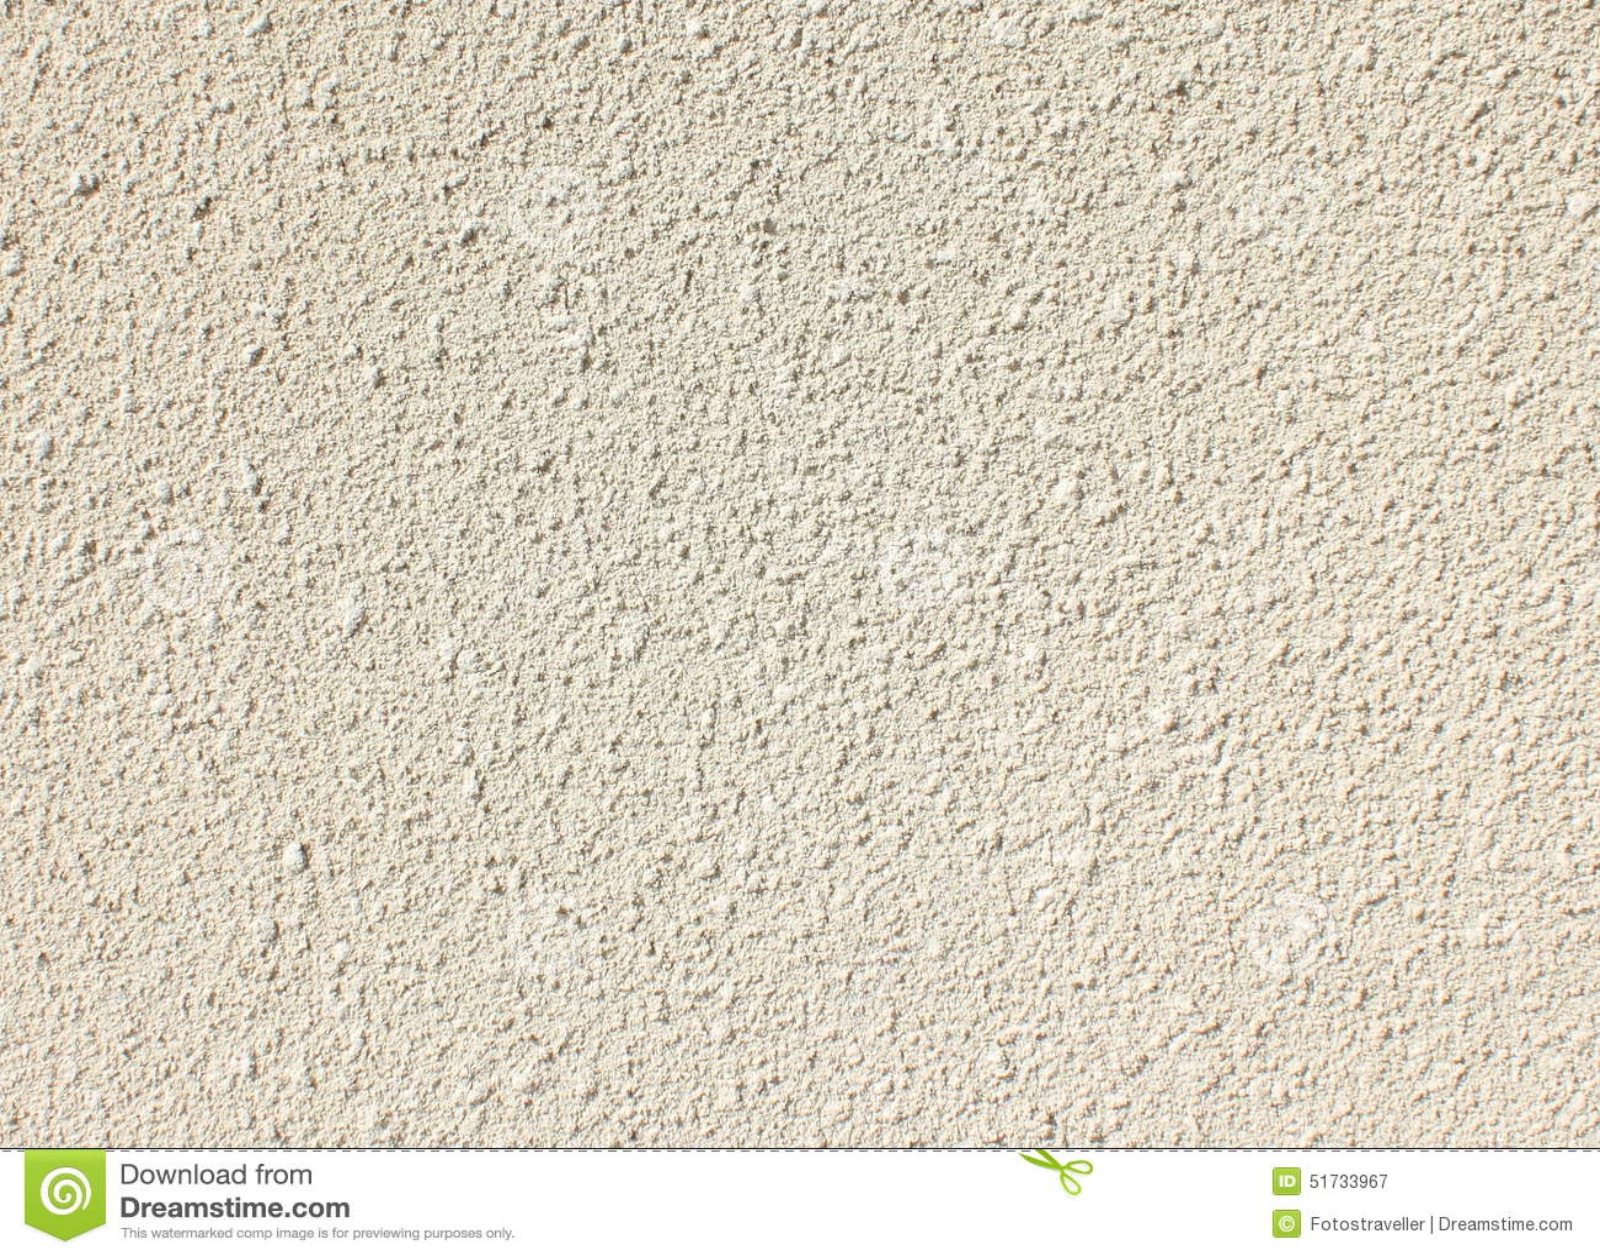 Plaster texture - Decorative plaster walls ...